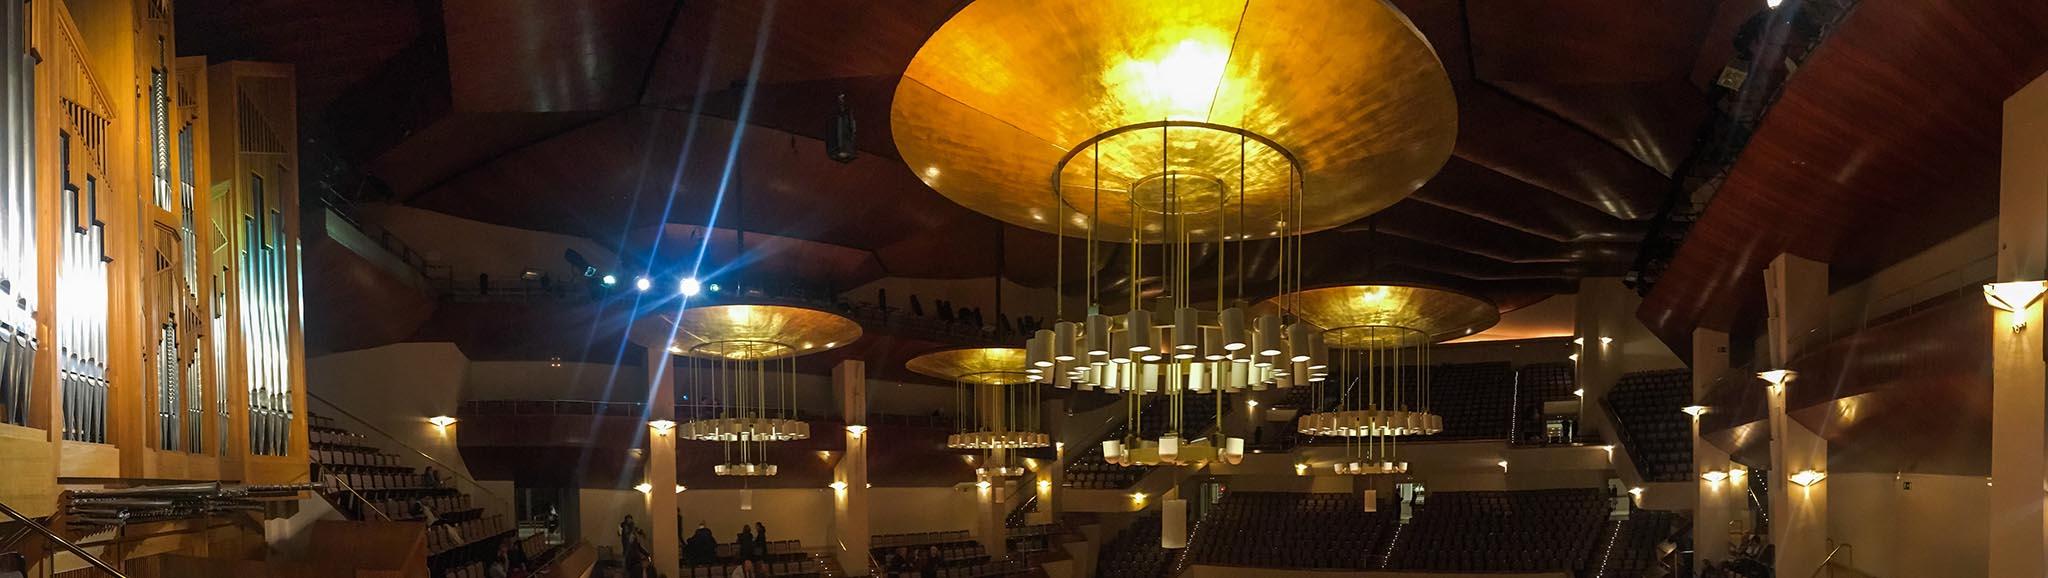 Мадрид — Концертный зал Аудиториум